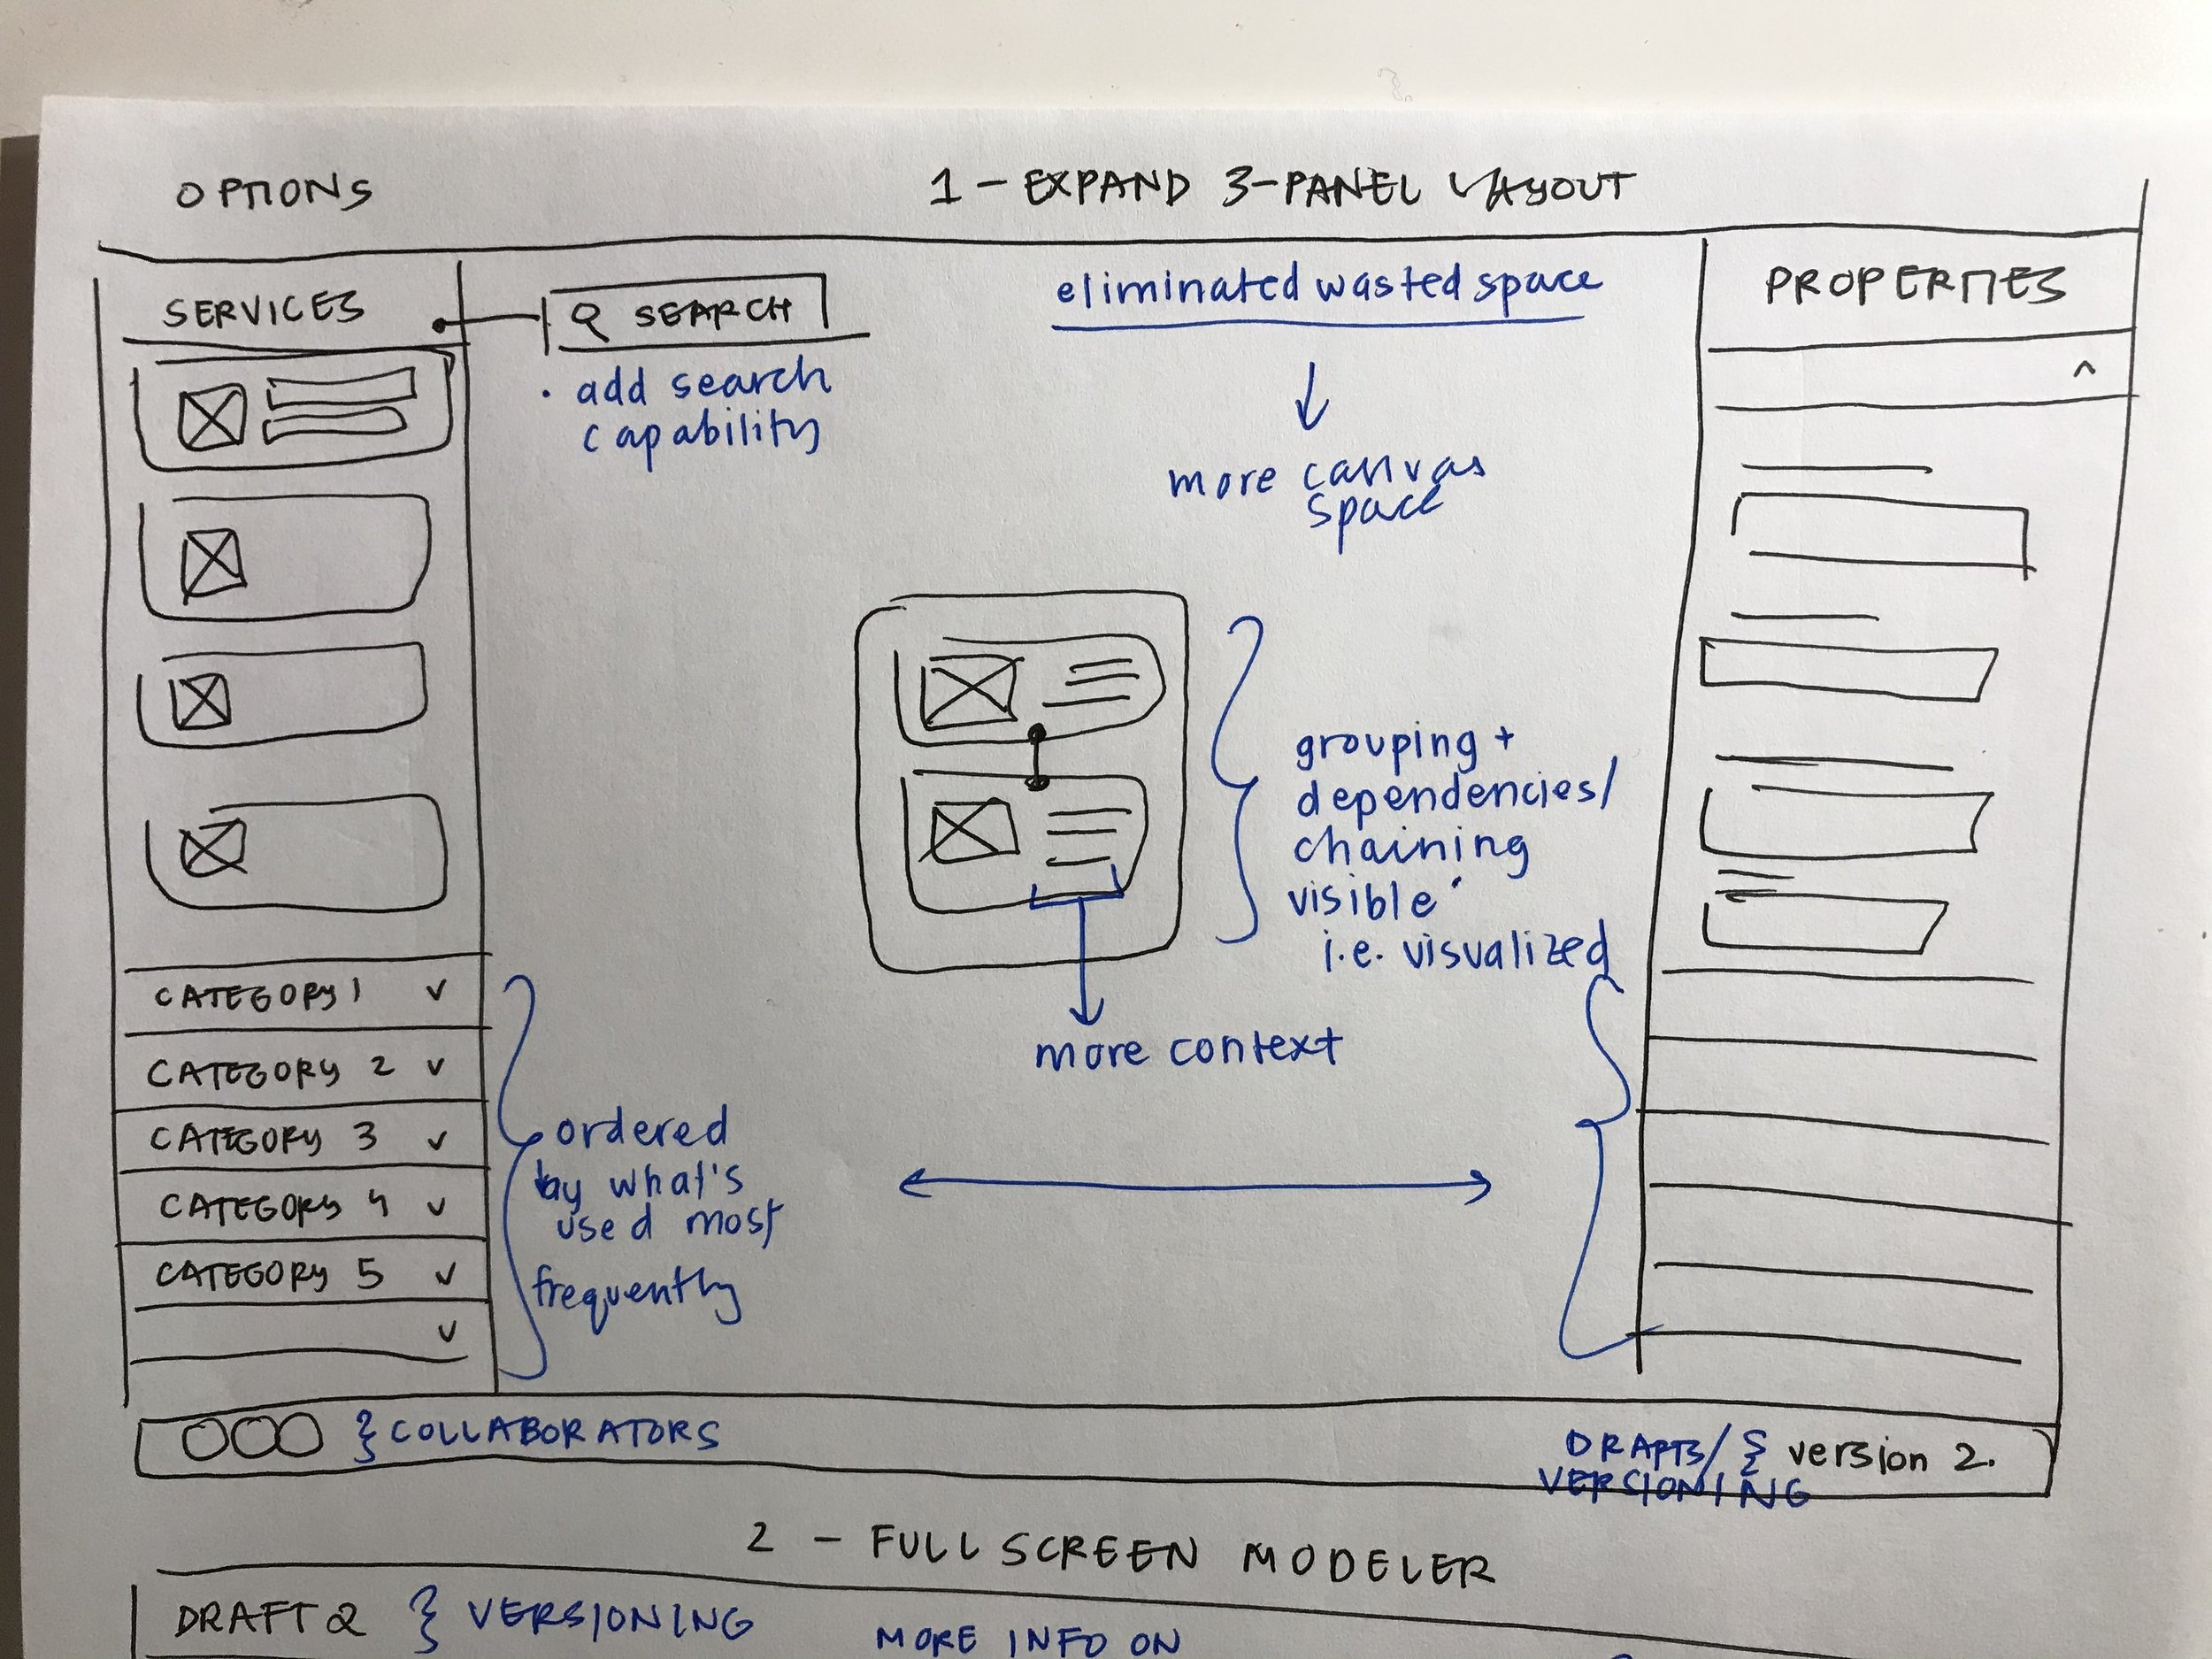 App Modeler Layout Option 1 (3 panel layout)